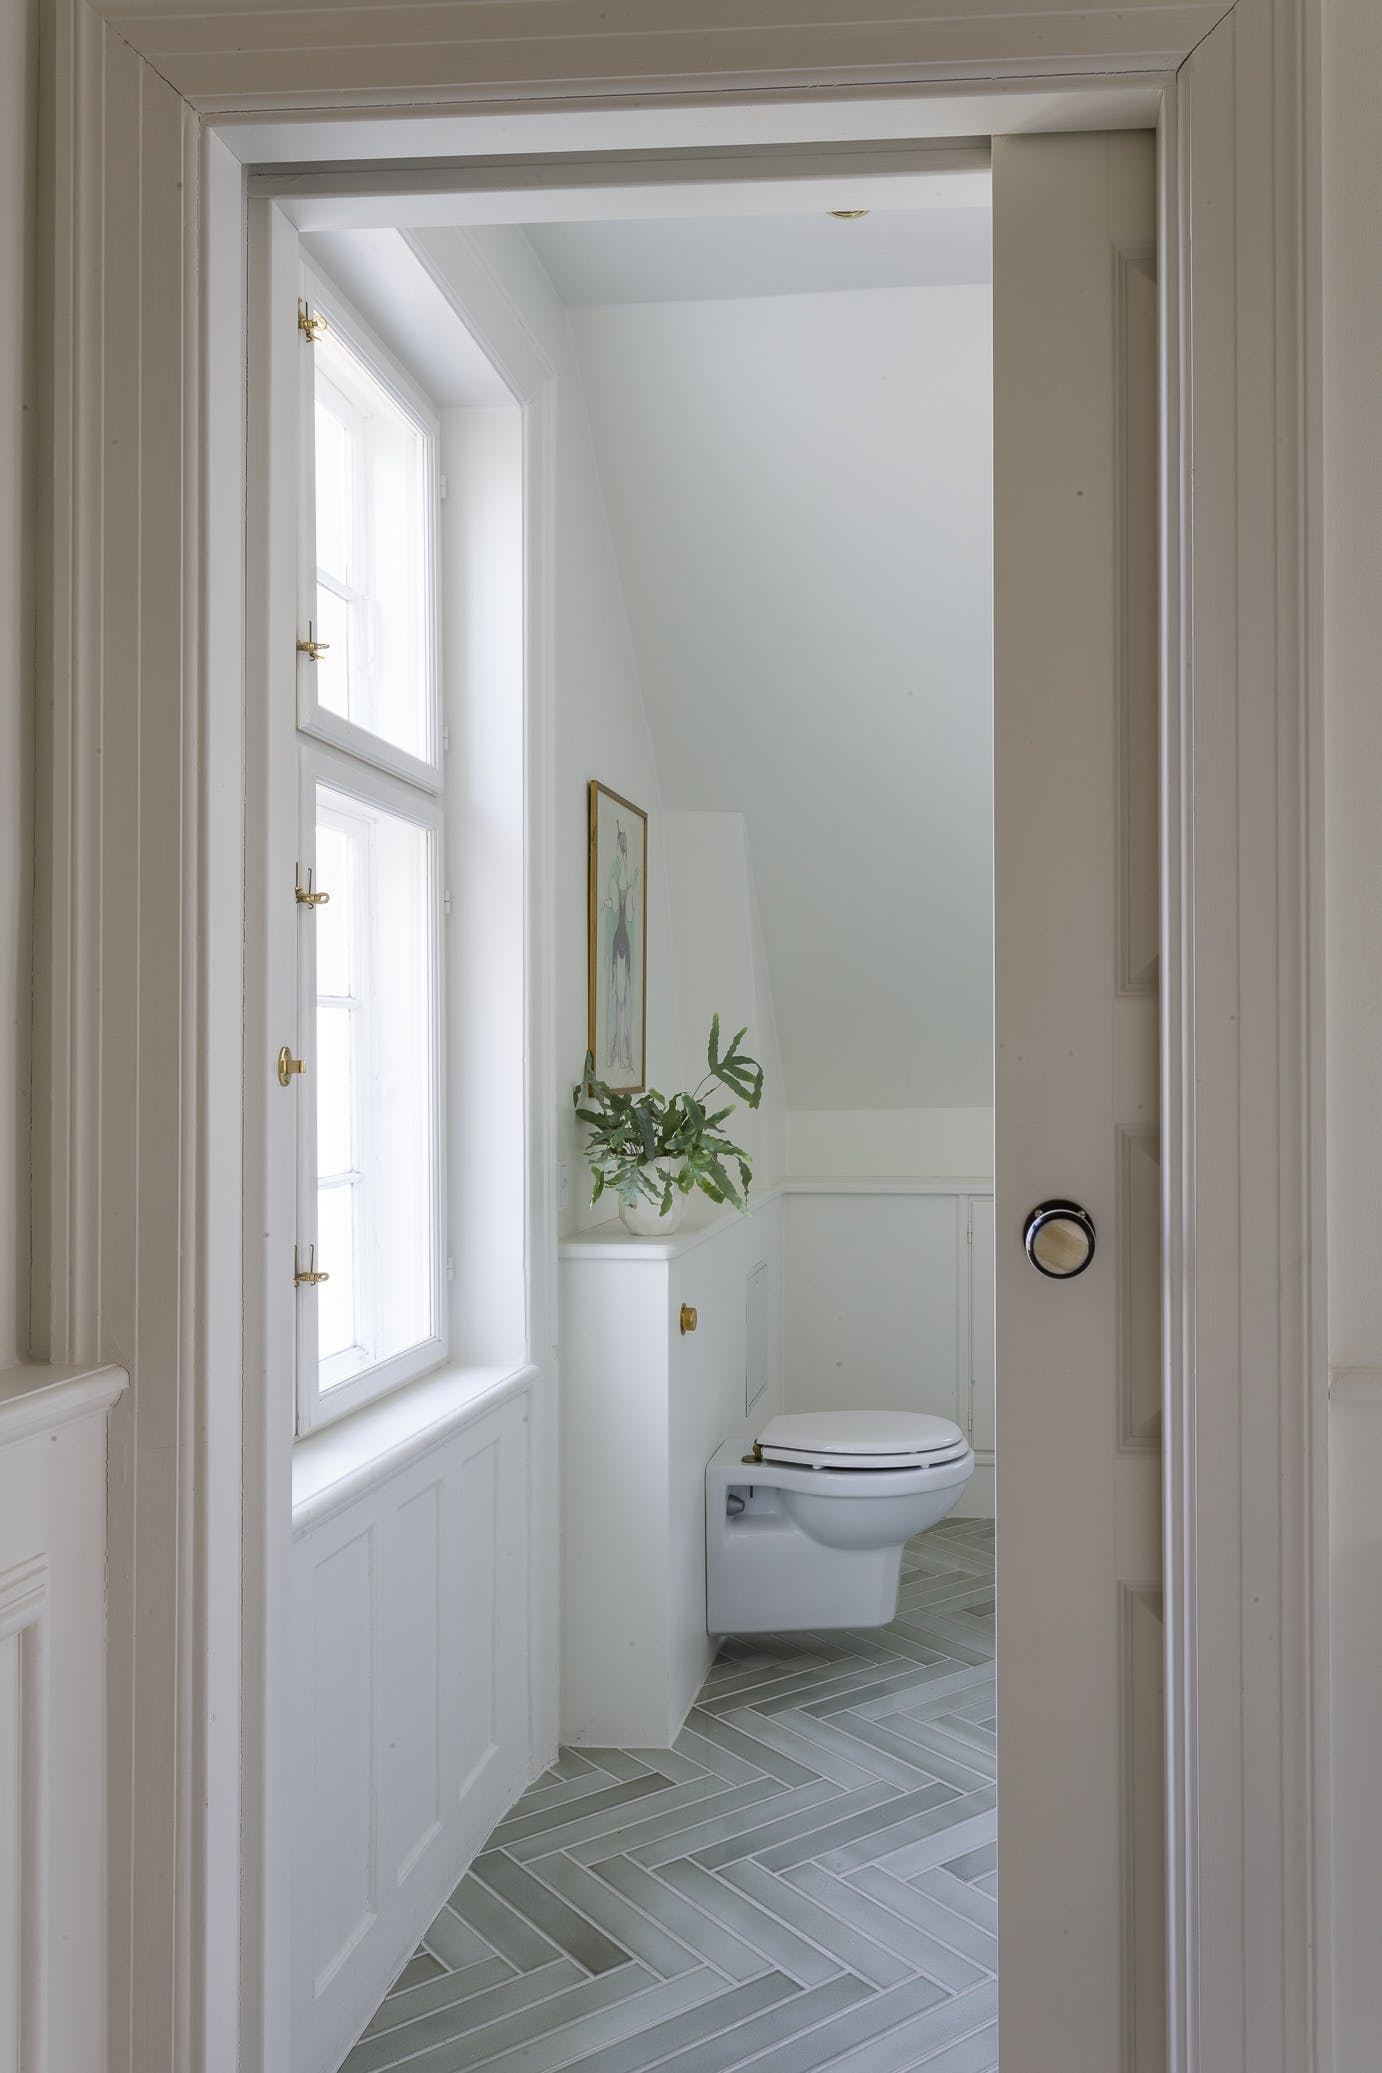 Toilet badeværelse sildebensmønster